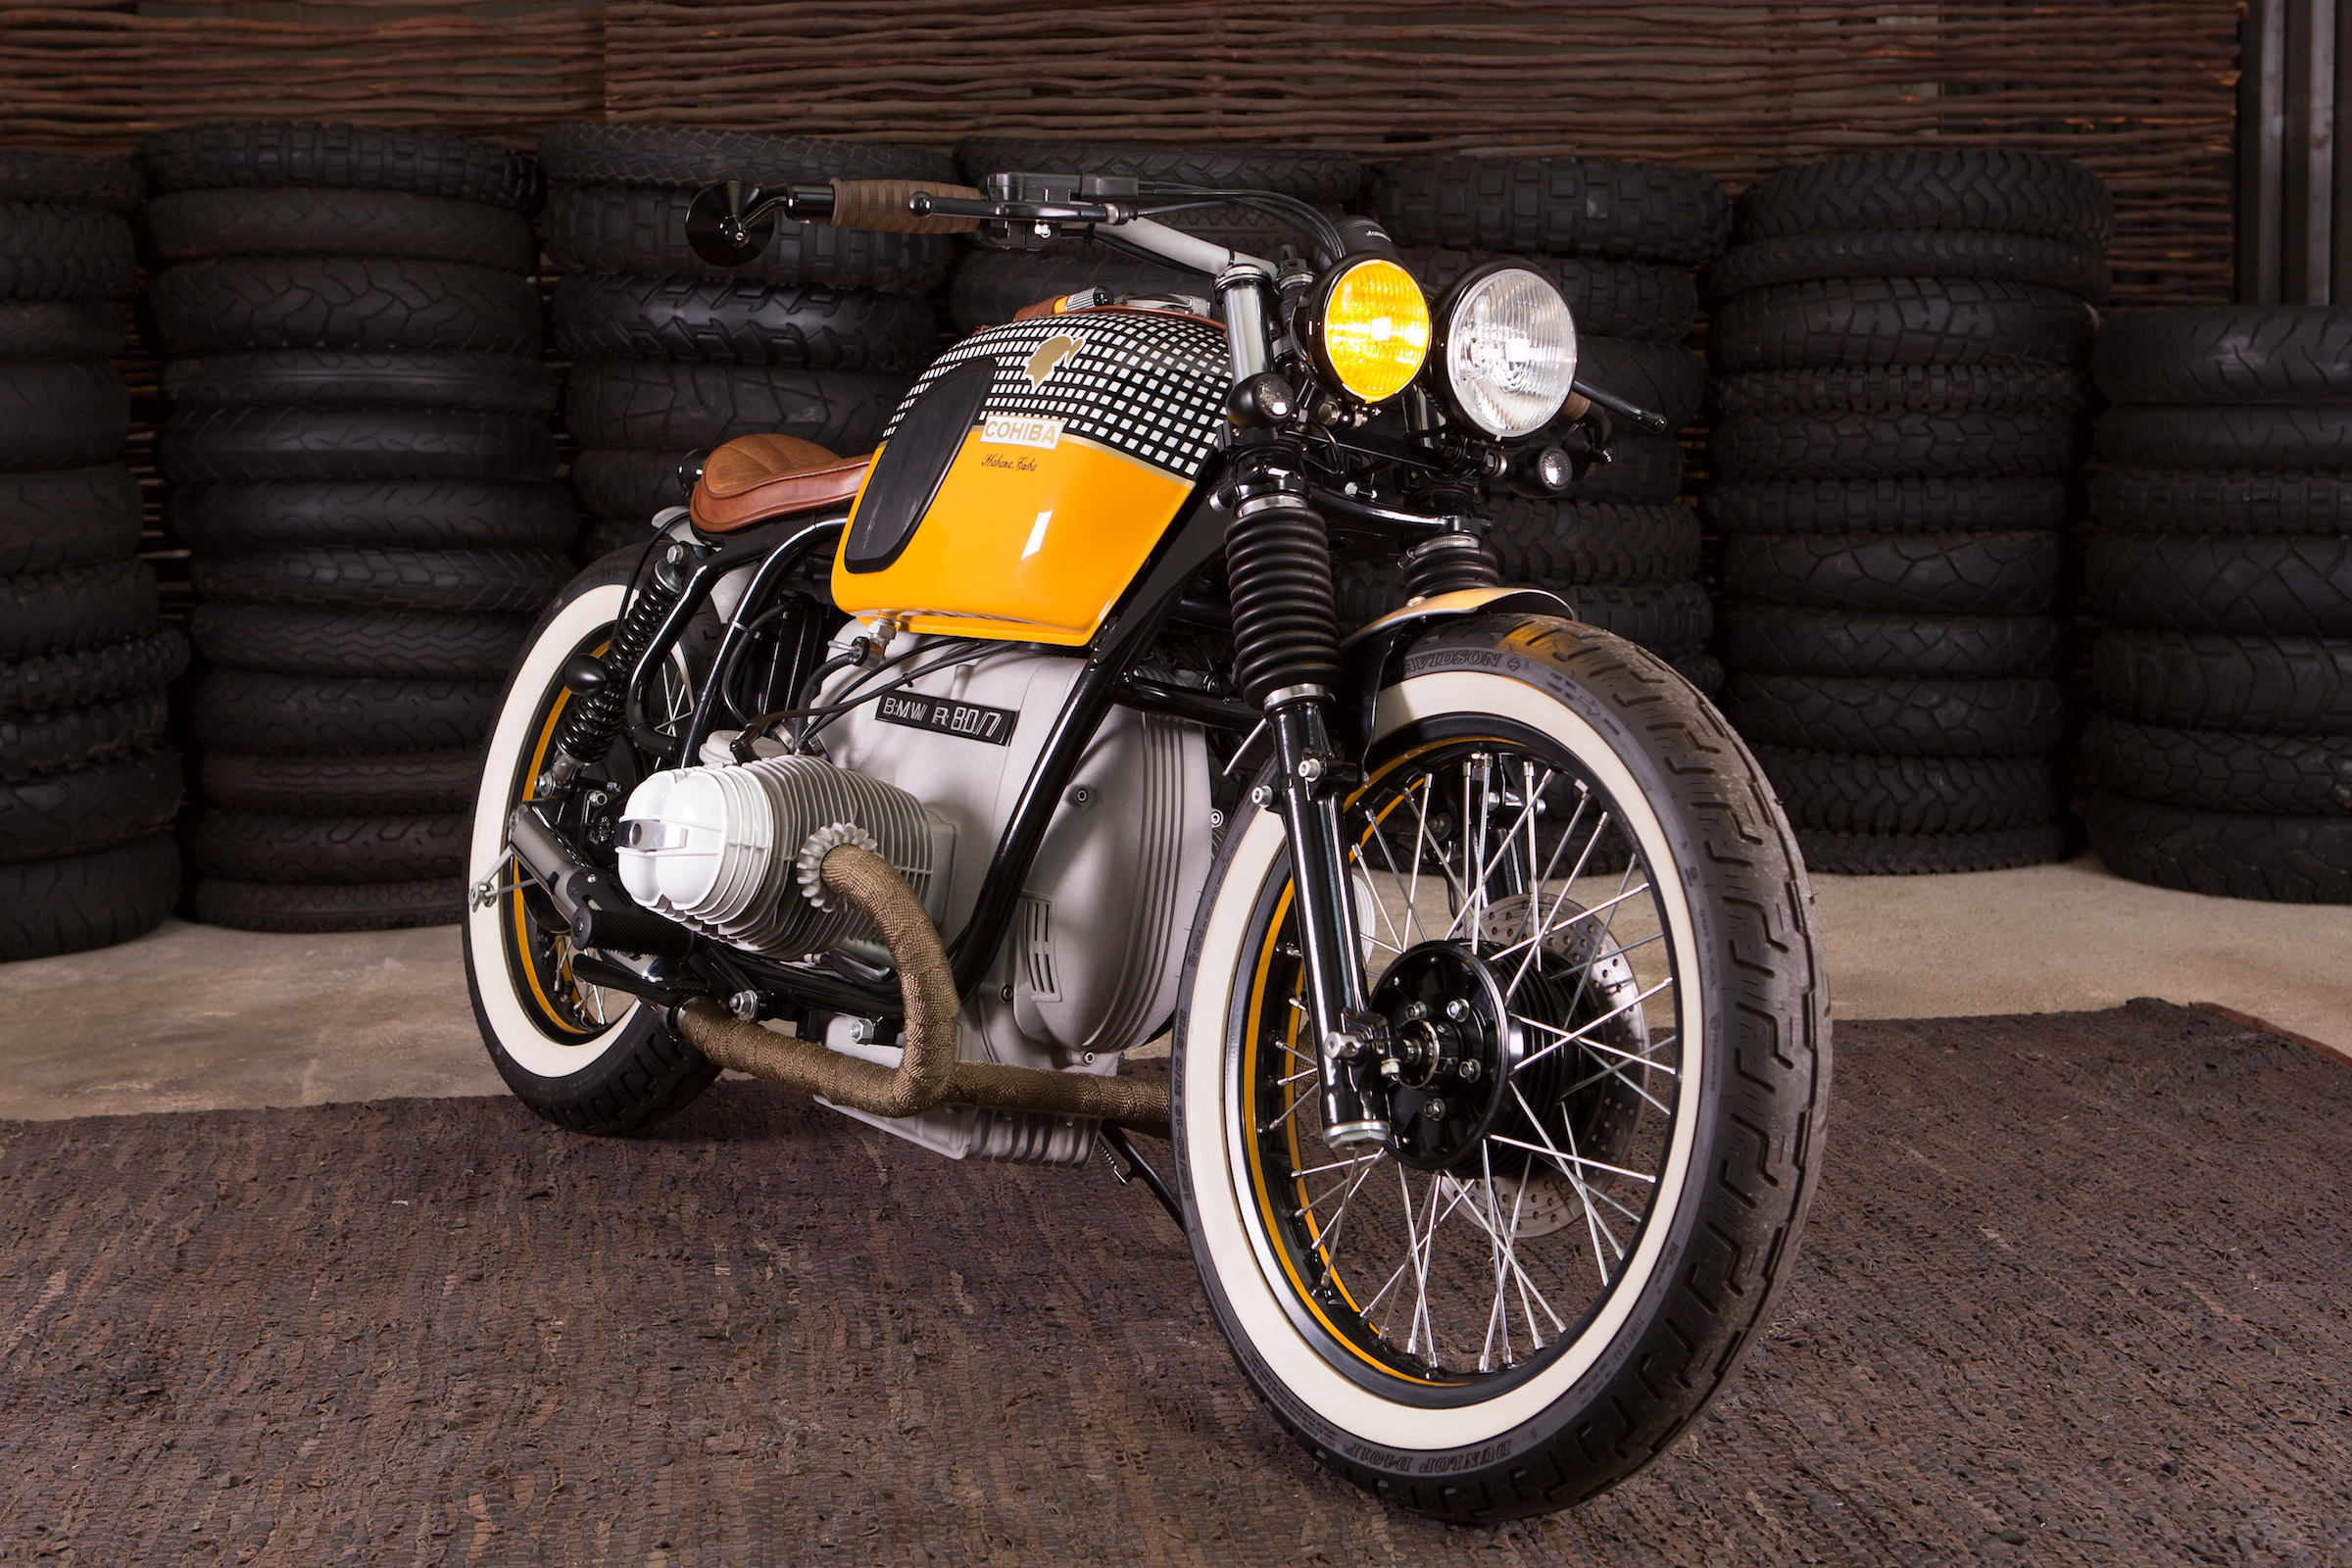 The Cytech Motorcycles BMW R80/7 Cohiba Bobber